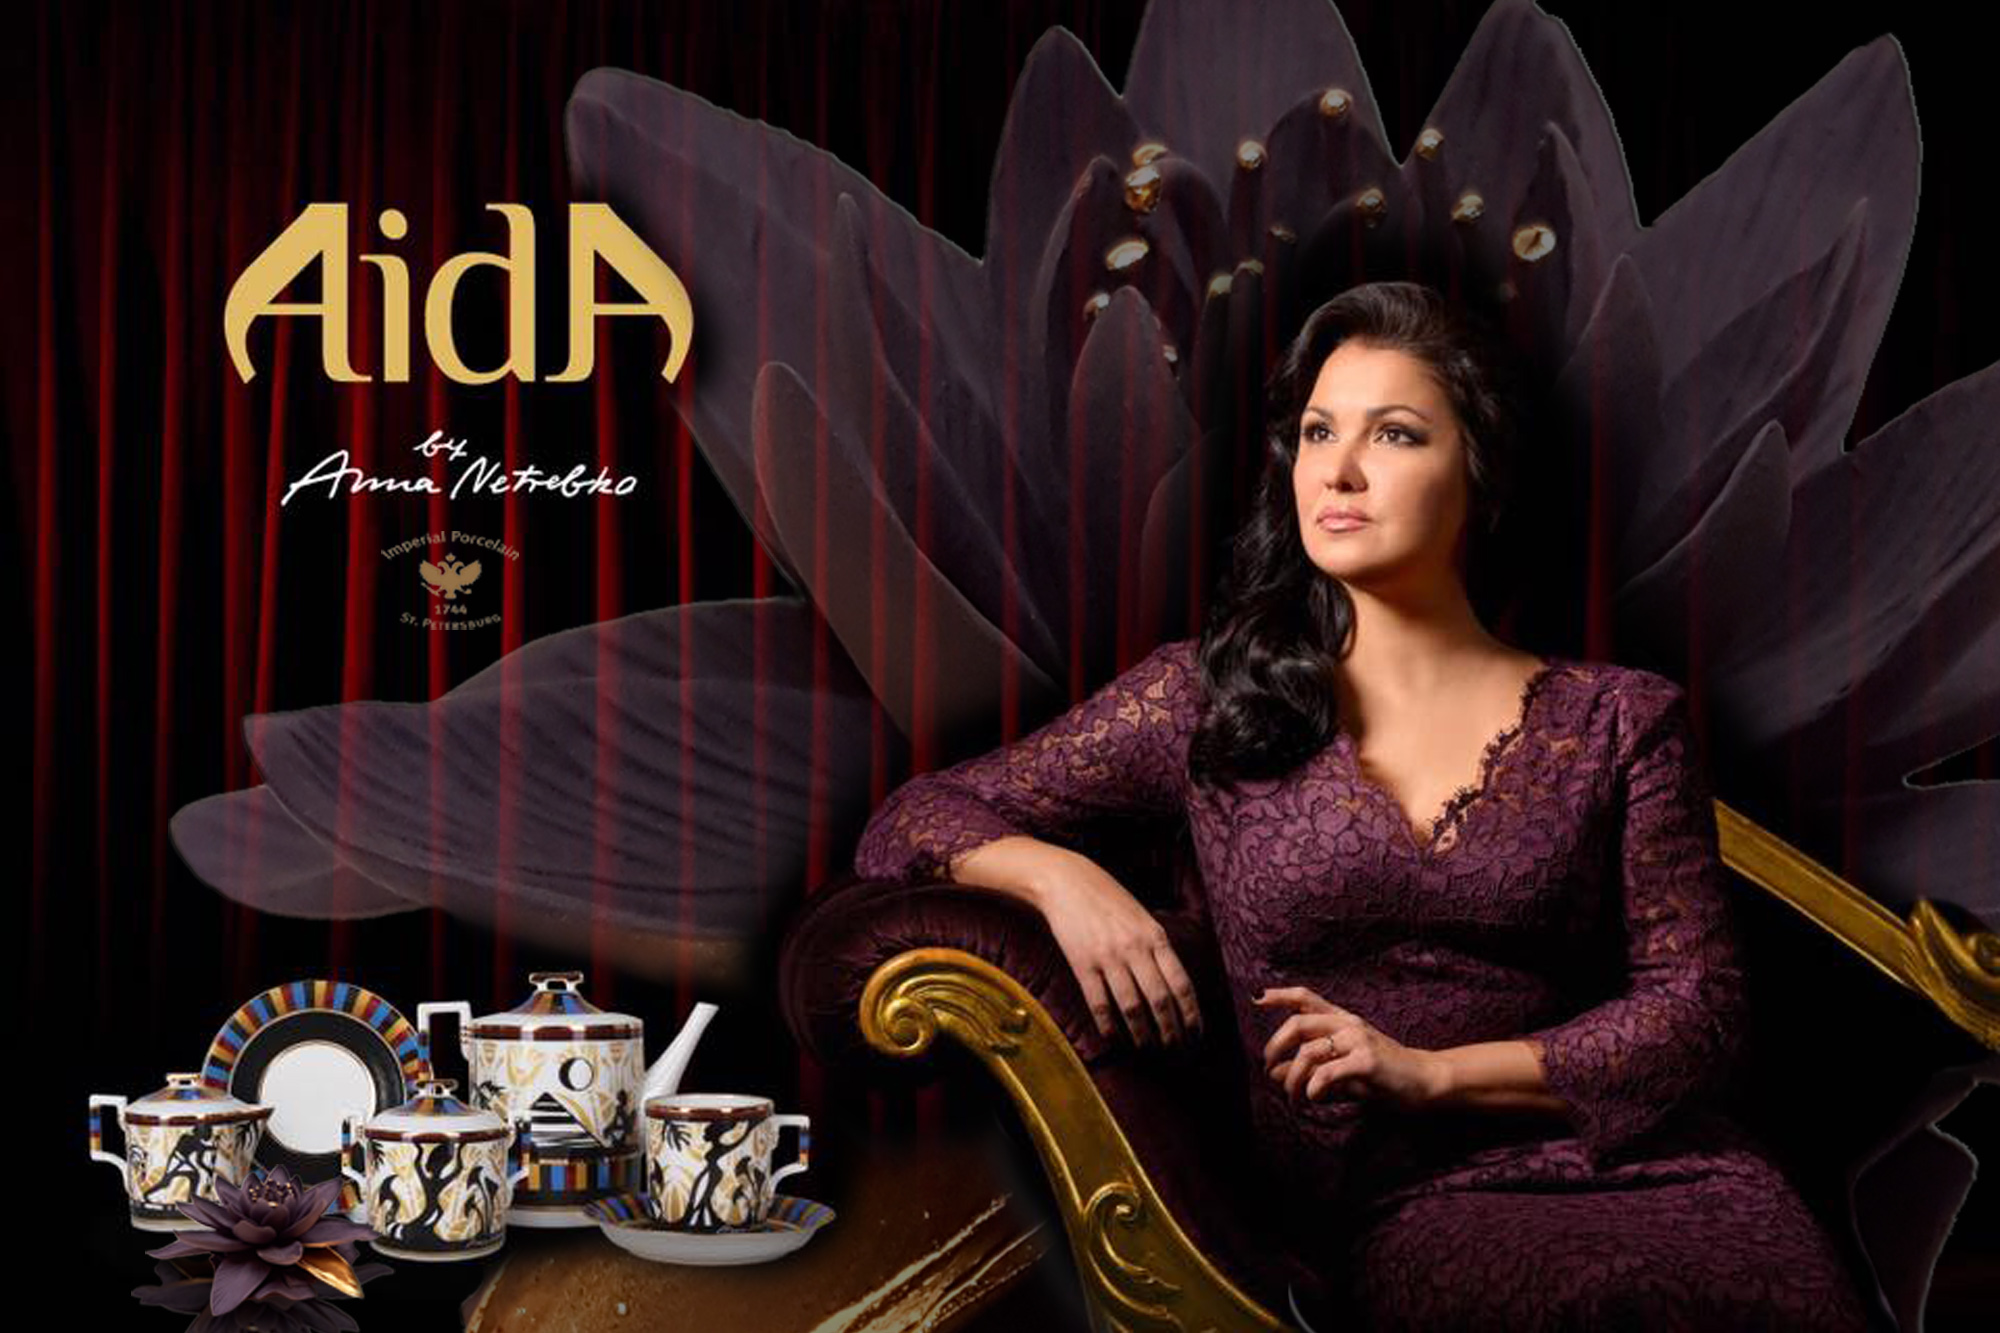 Anna Netrebko tea set Aida